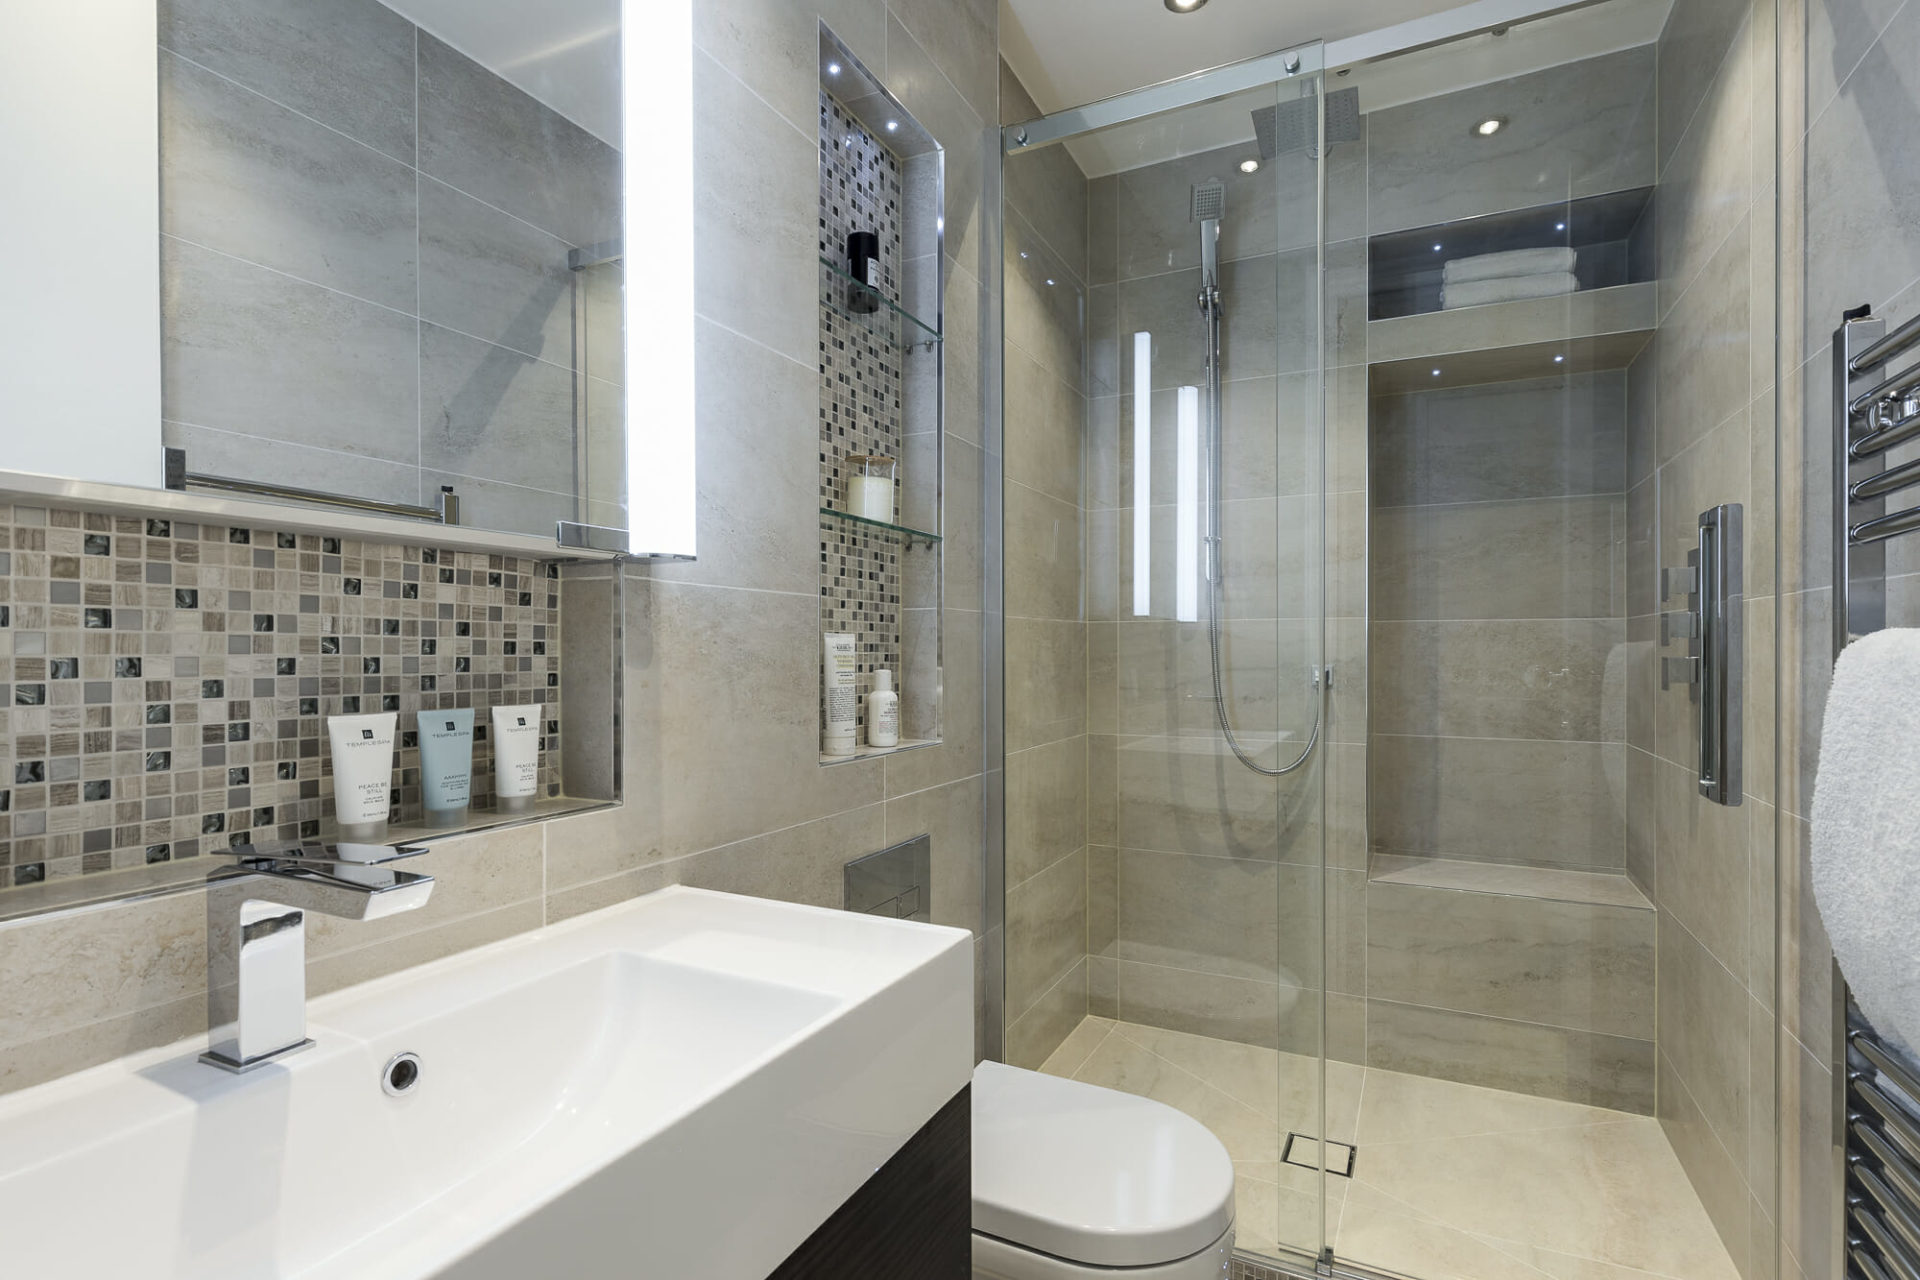 Shower Designs for Small Bathroom